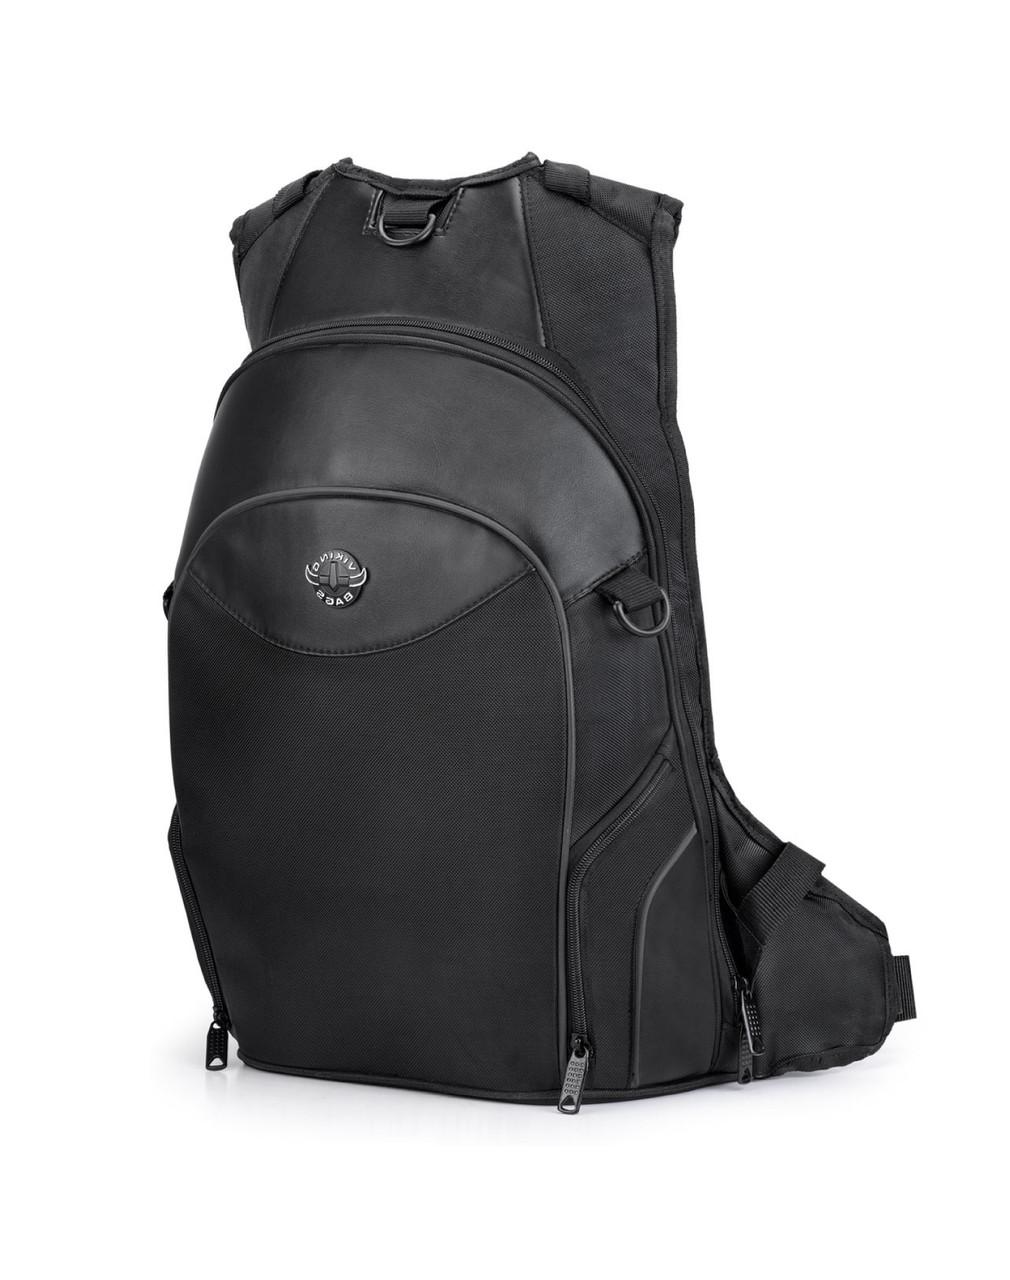 Viking Medium Black Street/Sportbike Backpack Main Bag View